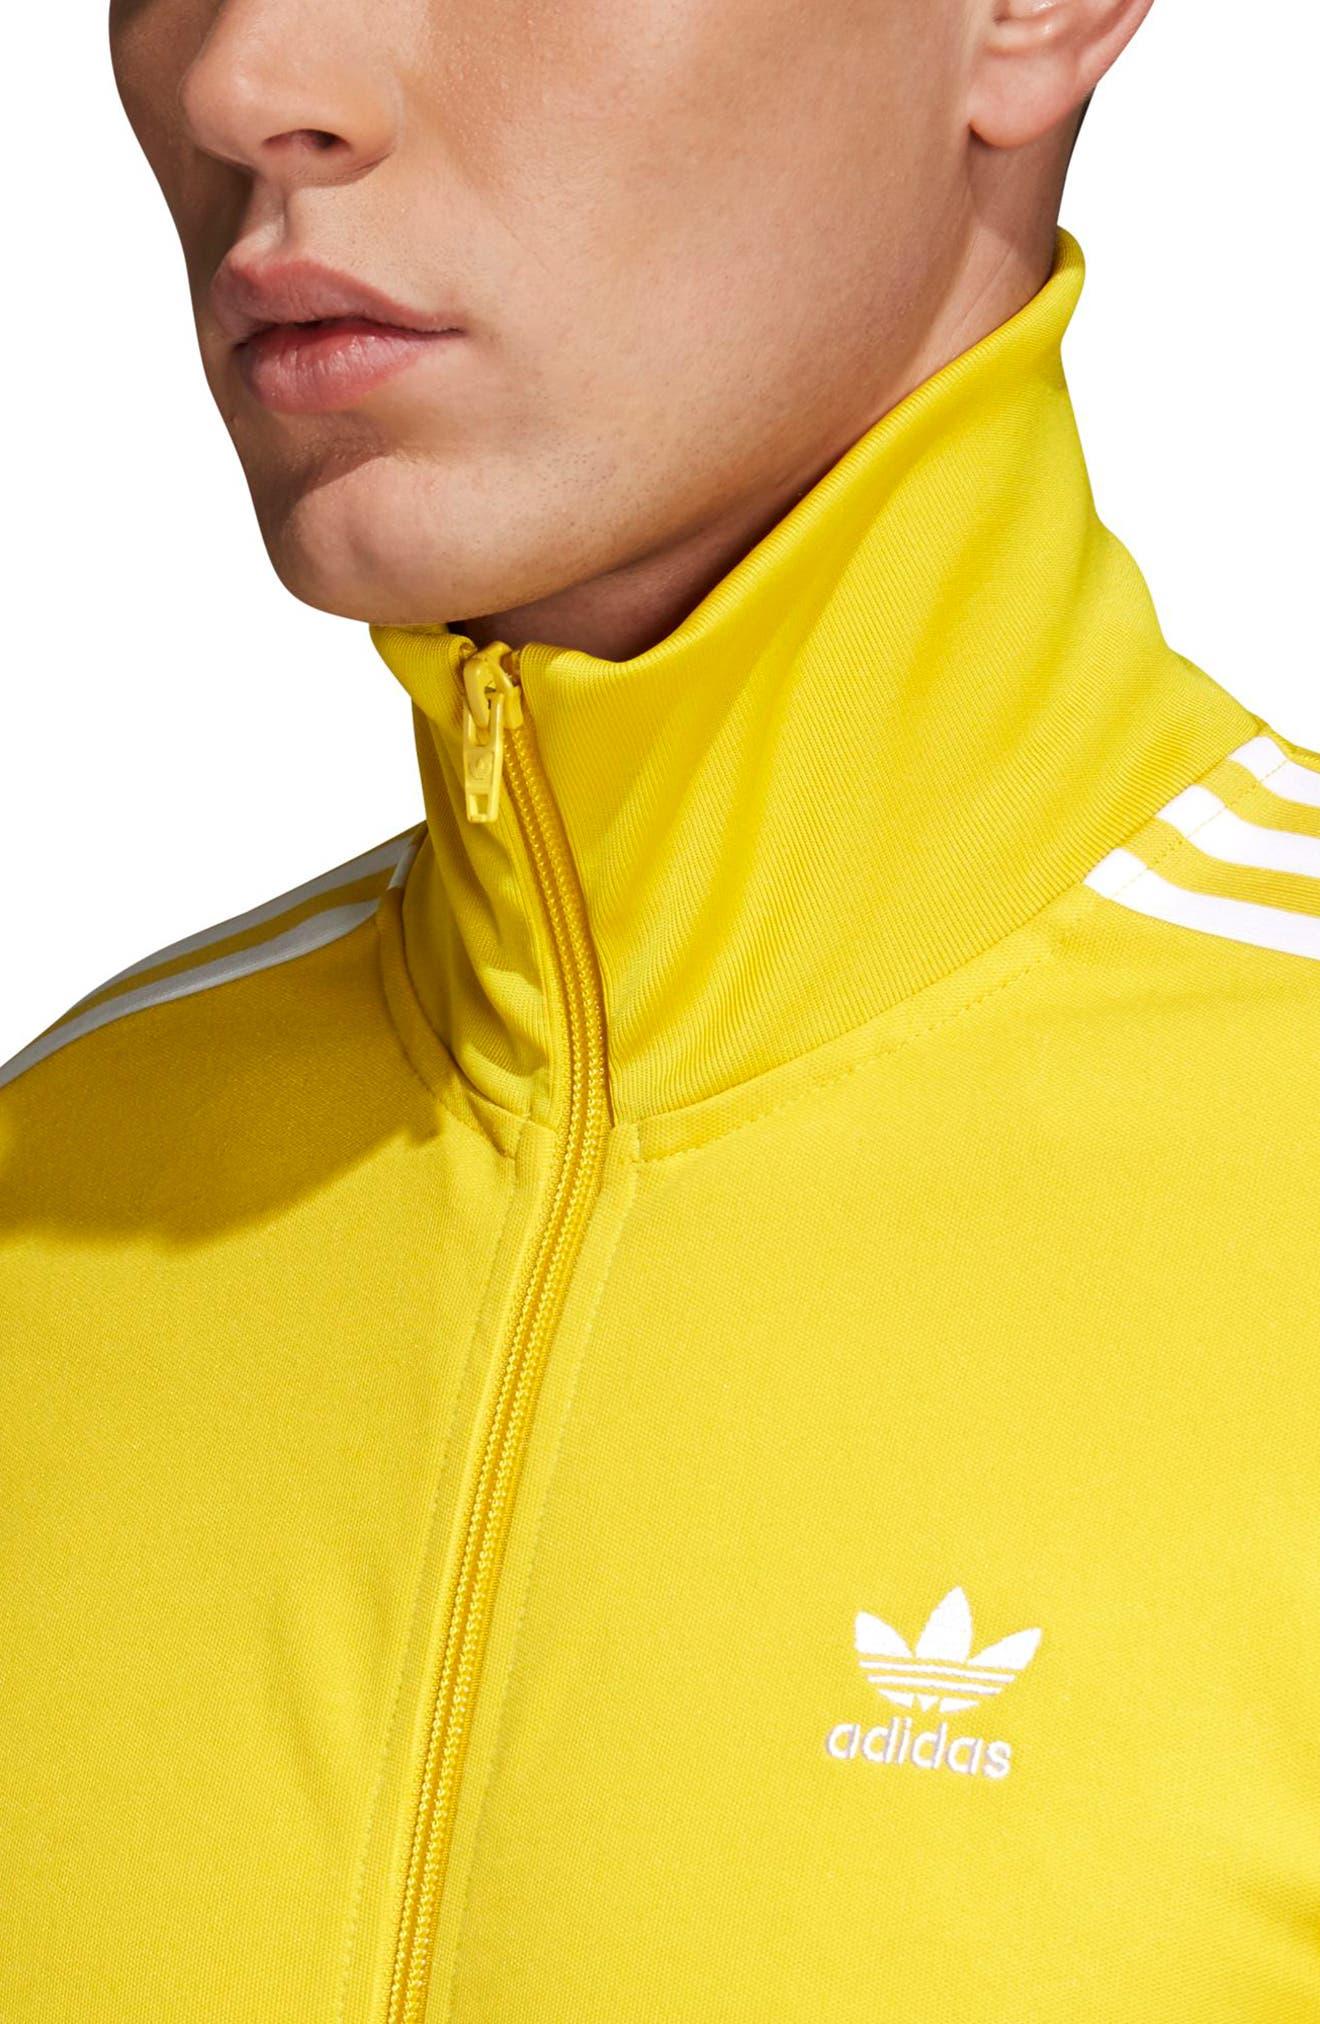 adidas Original Franz Beckenbauer Track Jacket,                             Alternate thumbnail 4, color,                             Tribe Yellow